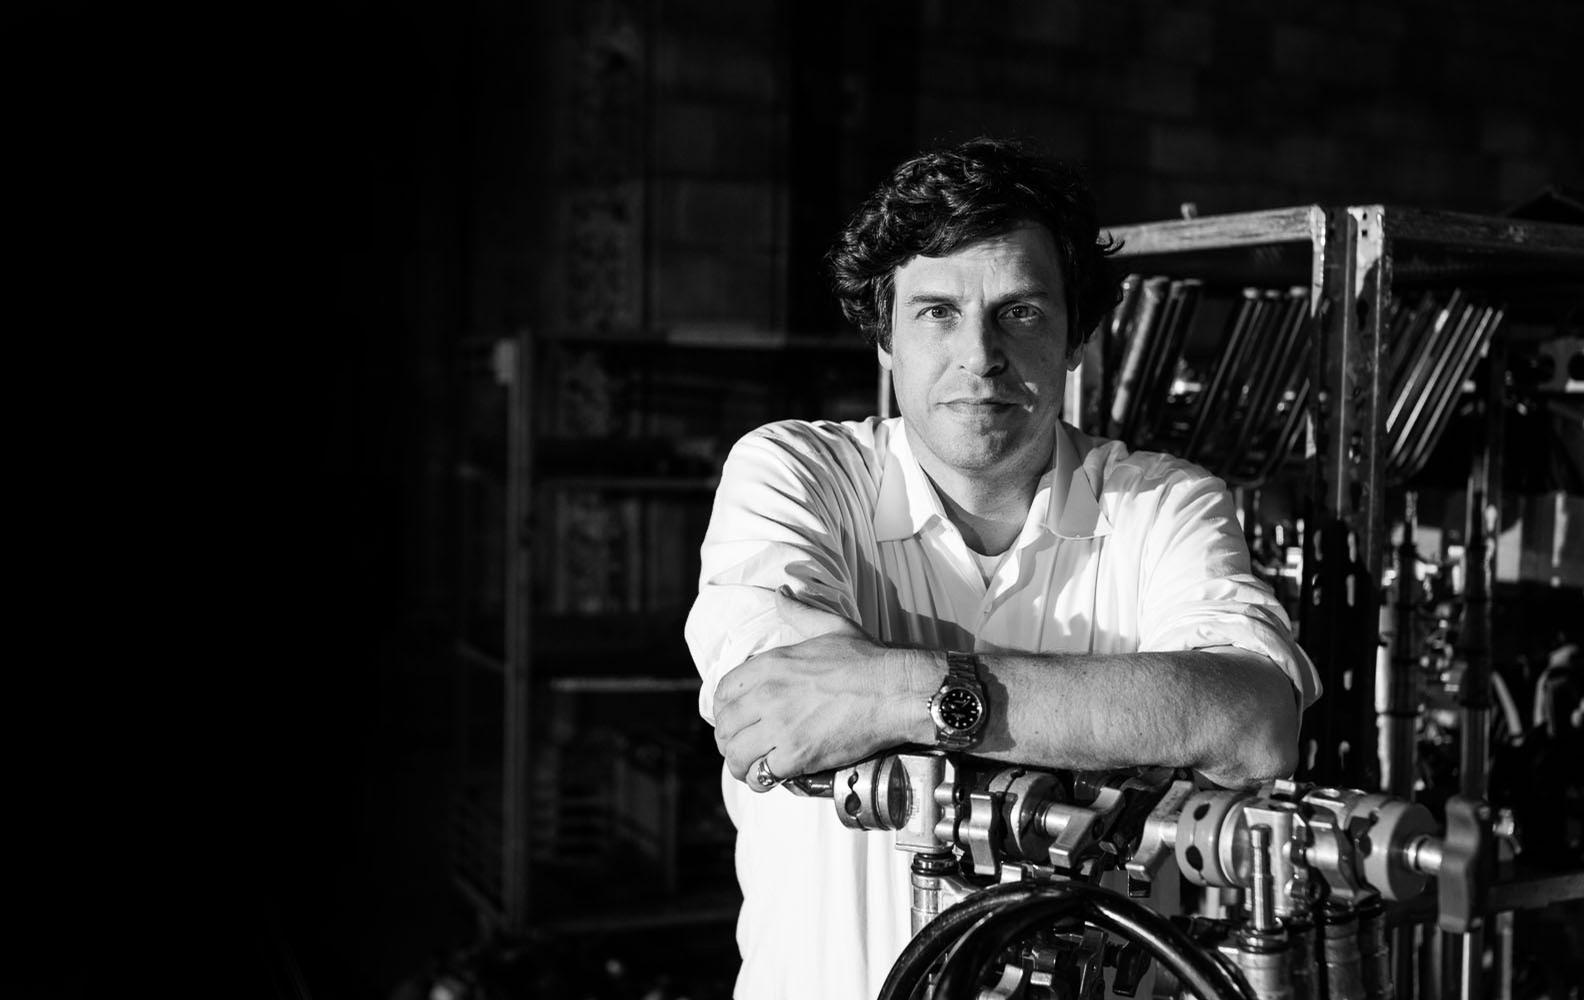 Anthony Geffen set up Atlantic Productions in 1992